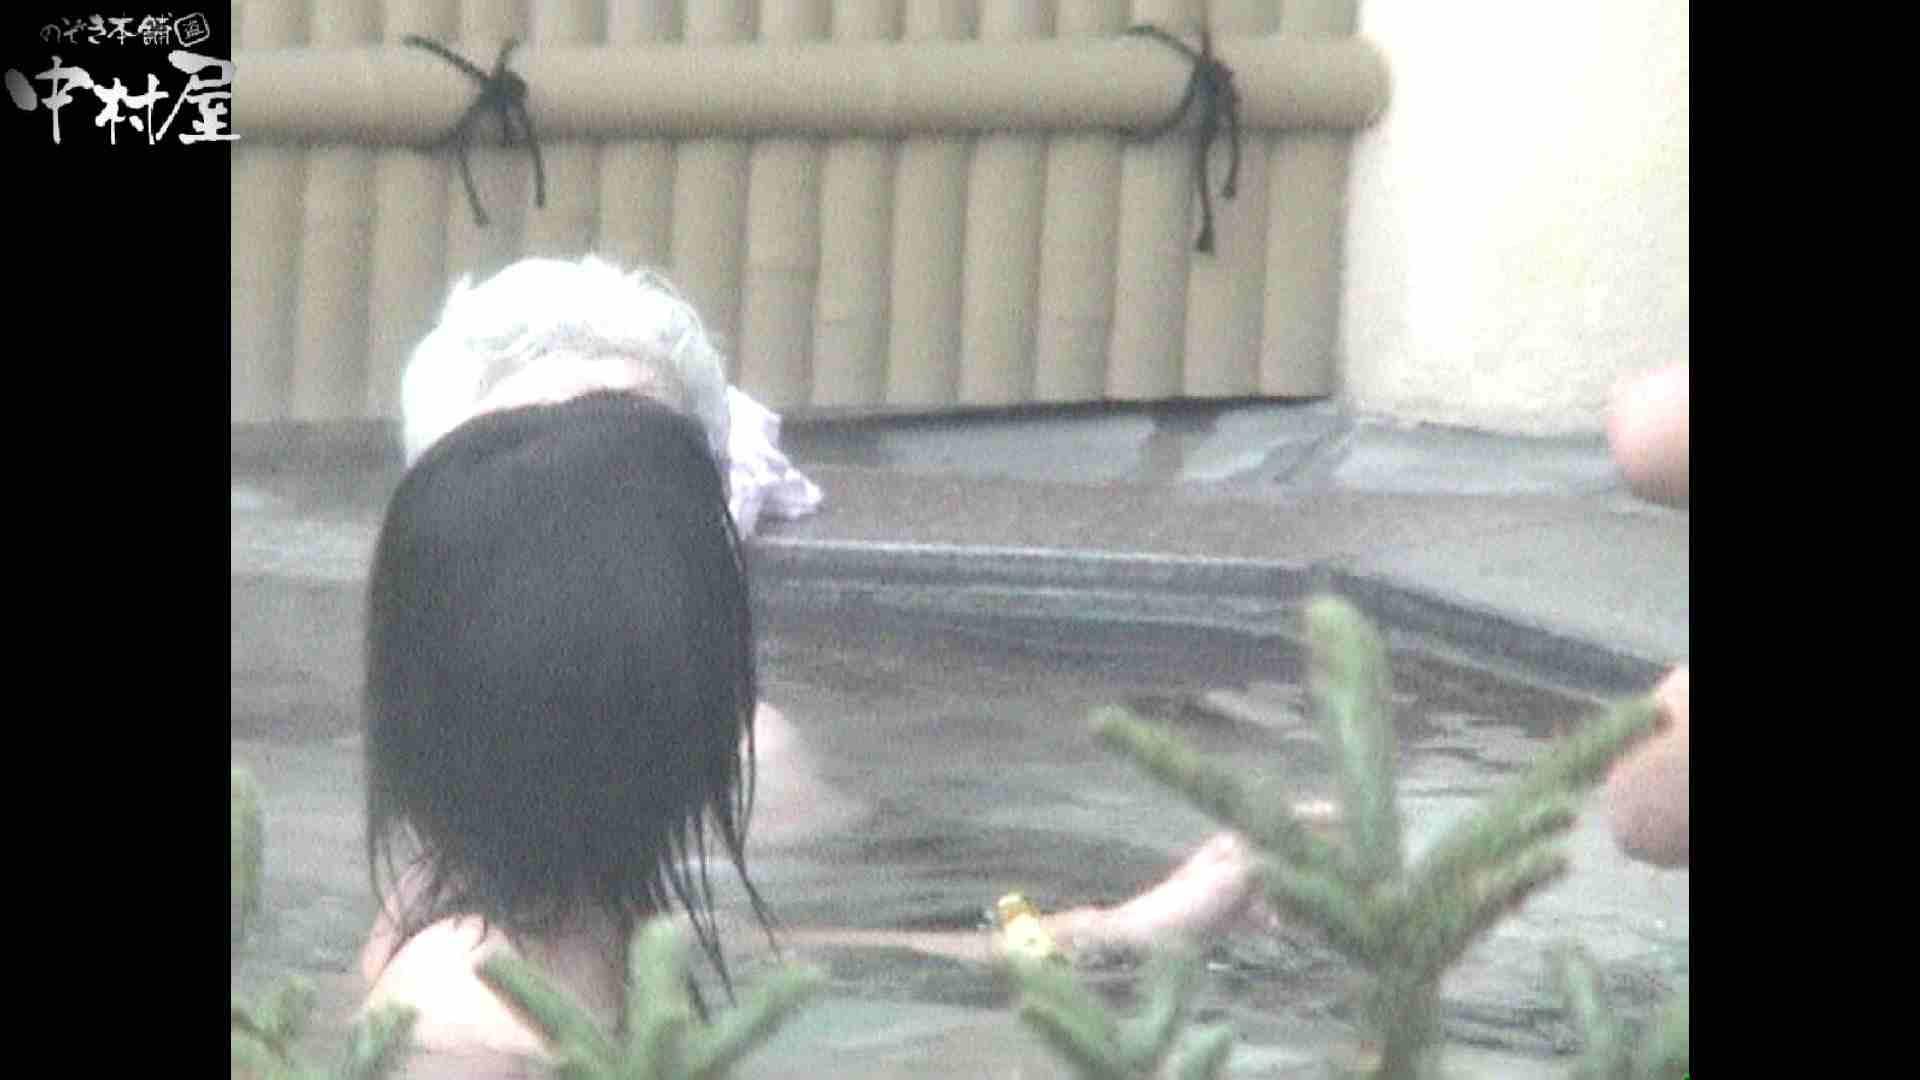 Aquaな露天風呂Vol.933 盗撮 おまんこ動画流出 78PICs 26